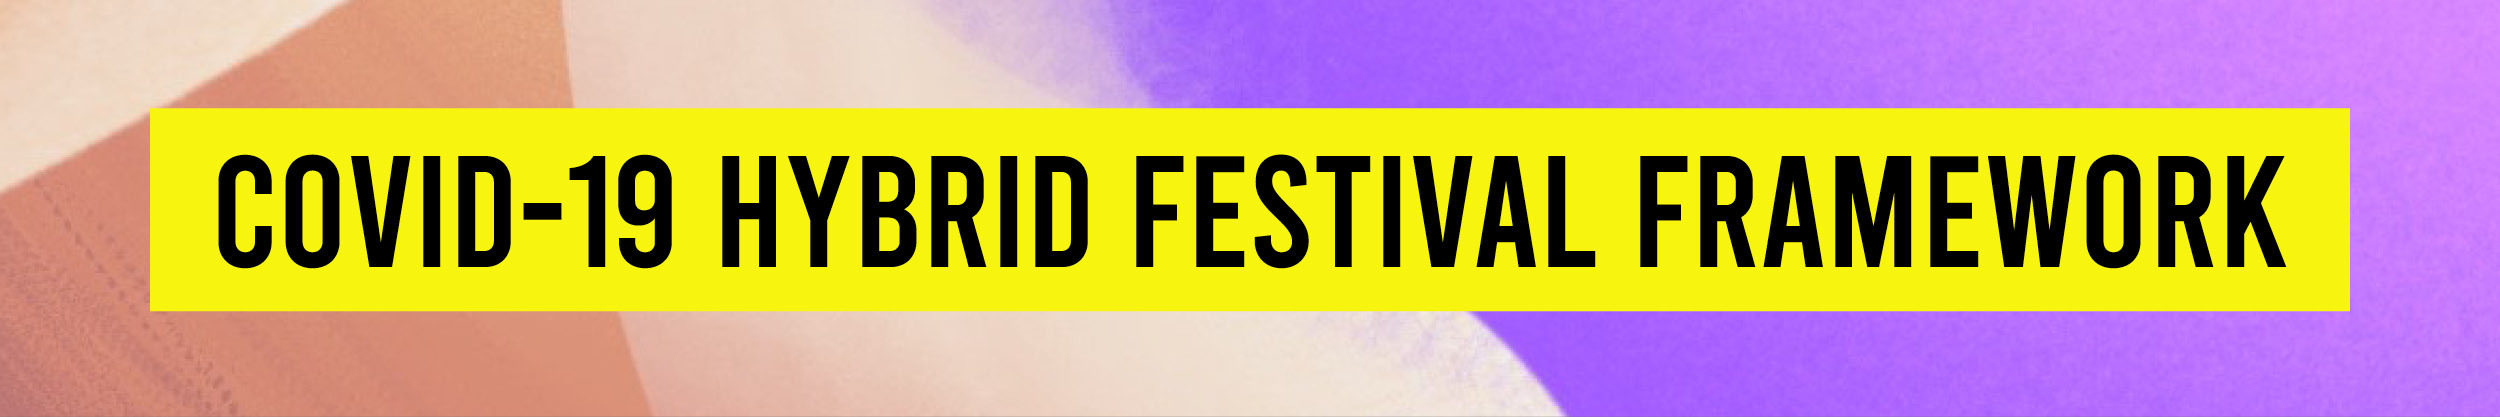 covid-19 hybrid festival framework